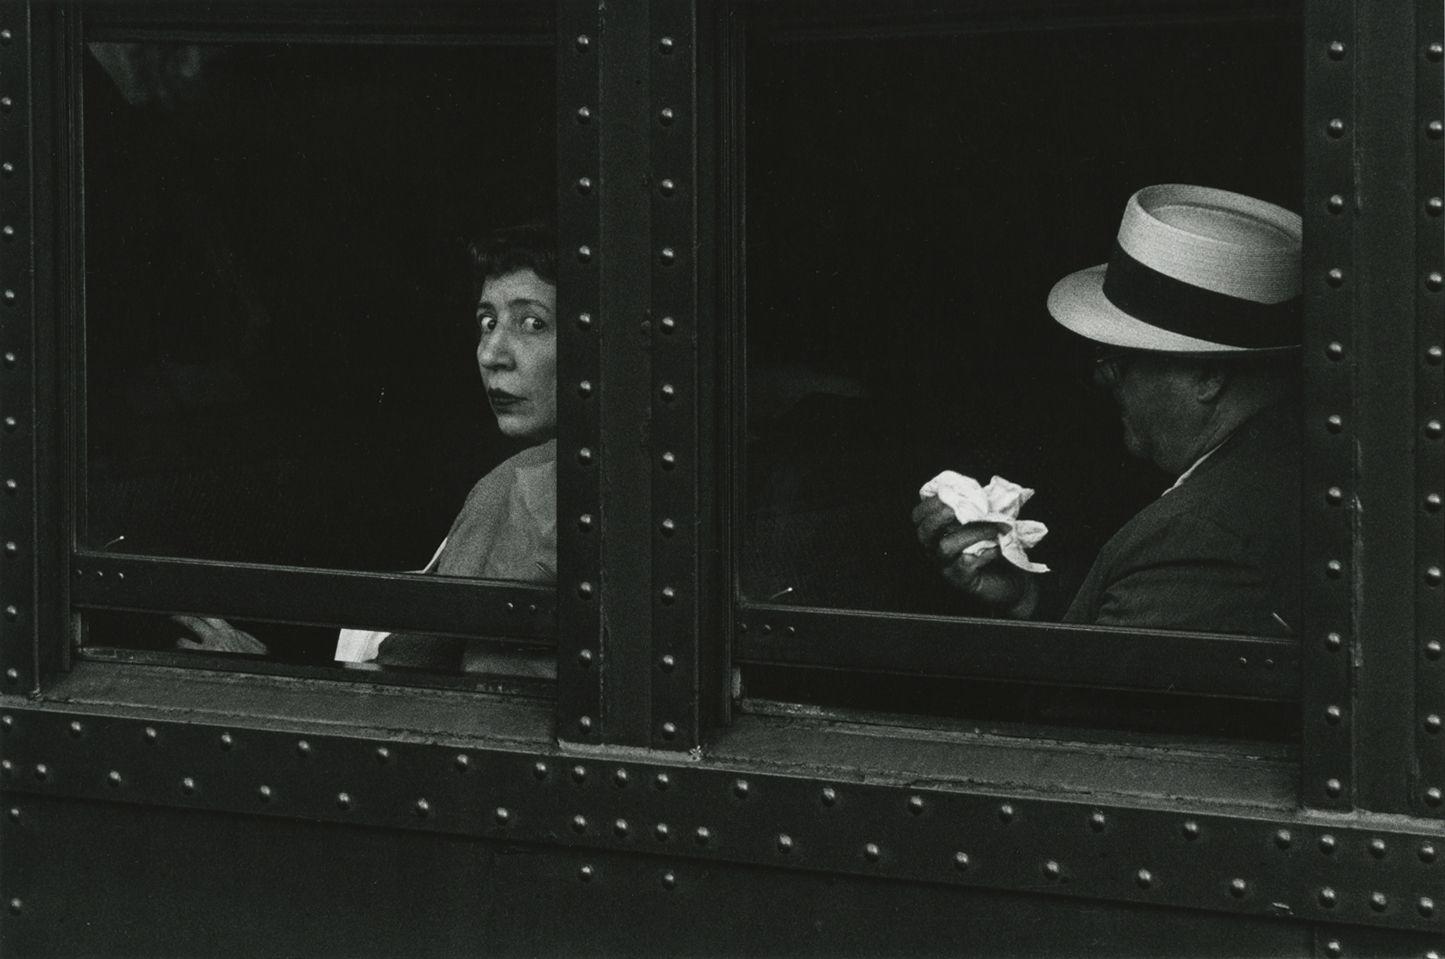 Ray K. Metzker - 59 CB-19, Chicago, 1959 - Howard Greenberg Gallery - 2018